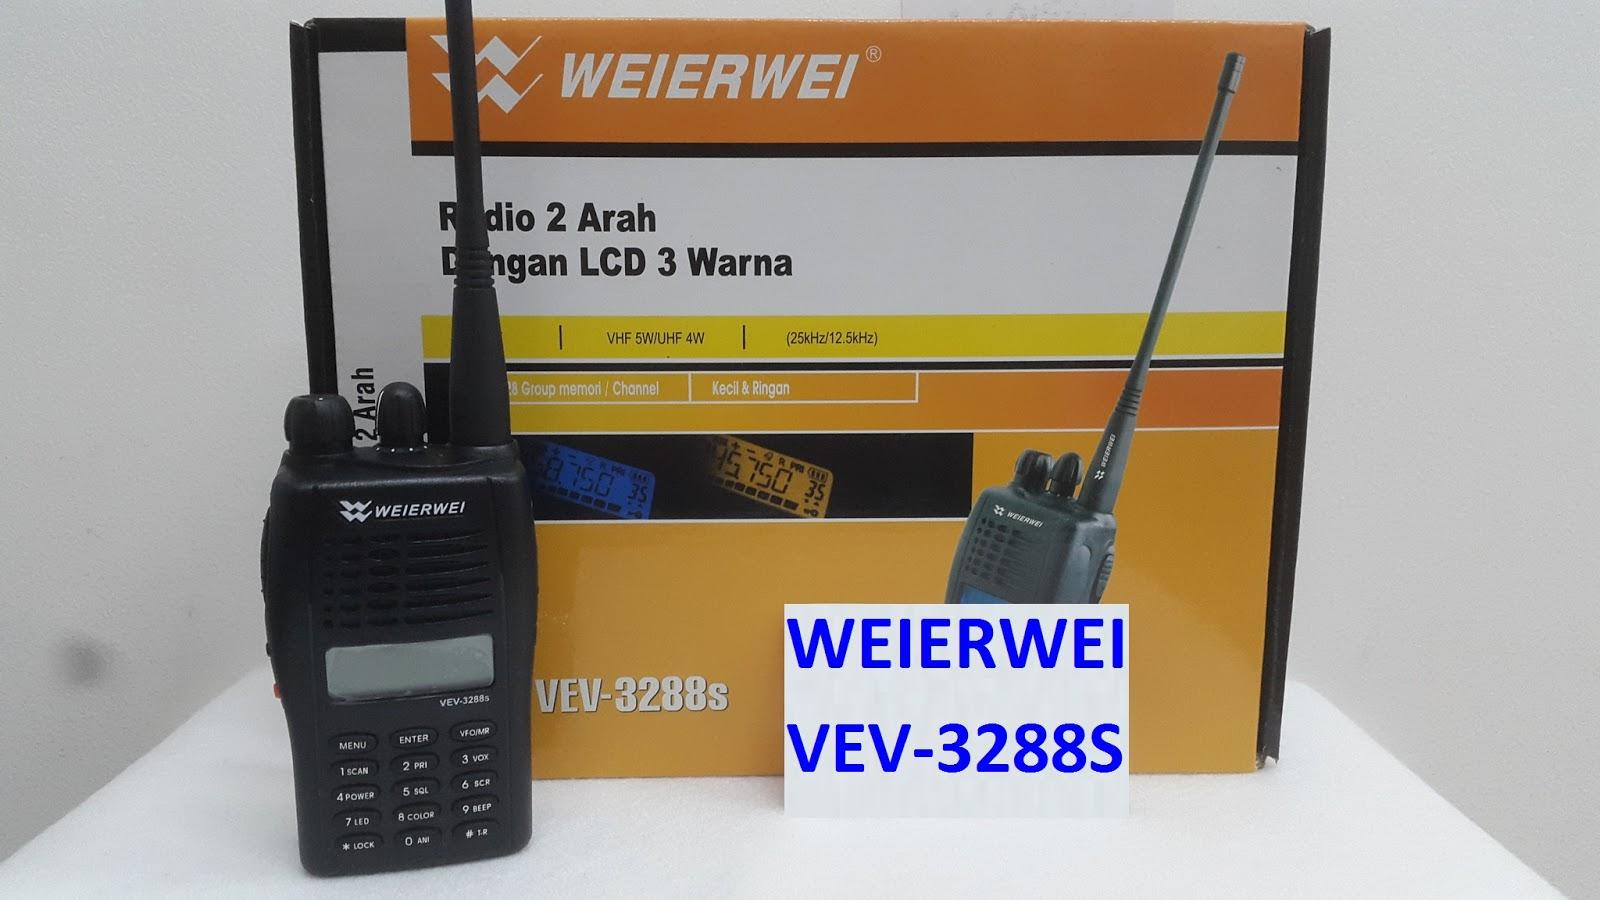 Ht Handy Talky Weierwei Vev 3288s Dual Band Vhf Uhf Mall Rb433ah Mulus Selasa 14 Juni 2016